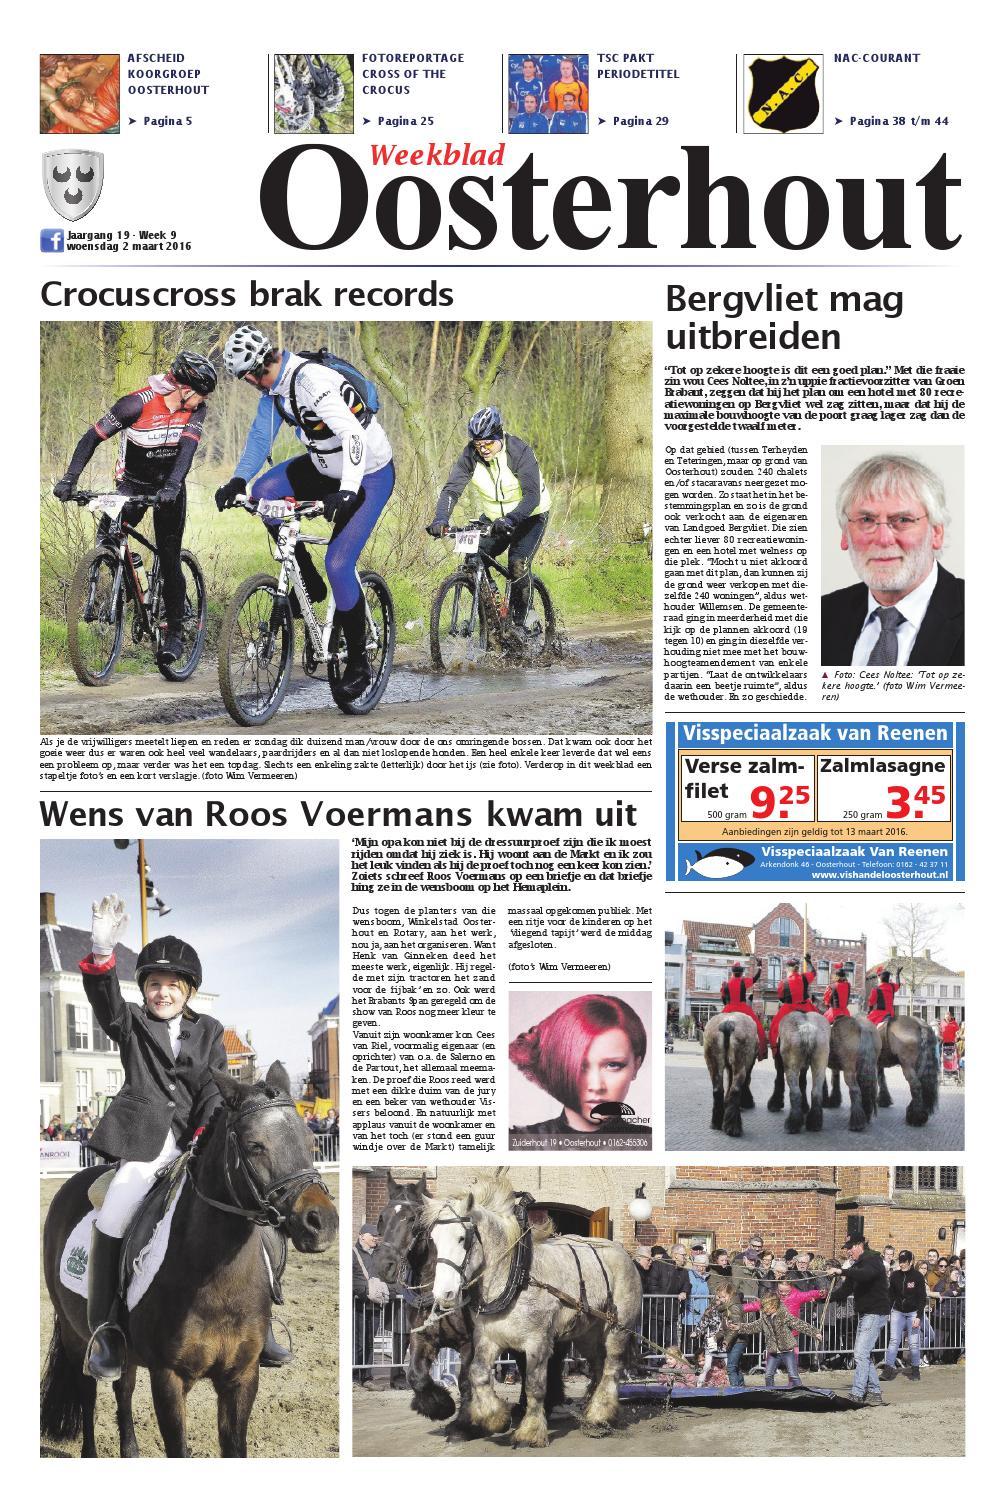 Weekblad oosterhout 25 11 2015 by uitgeverij em de jong   issuu